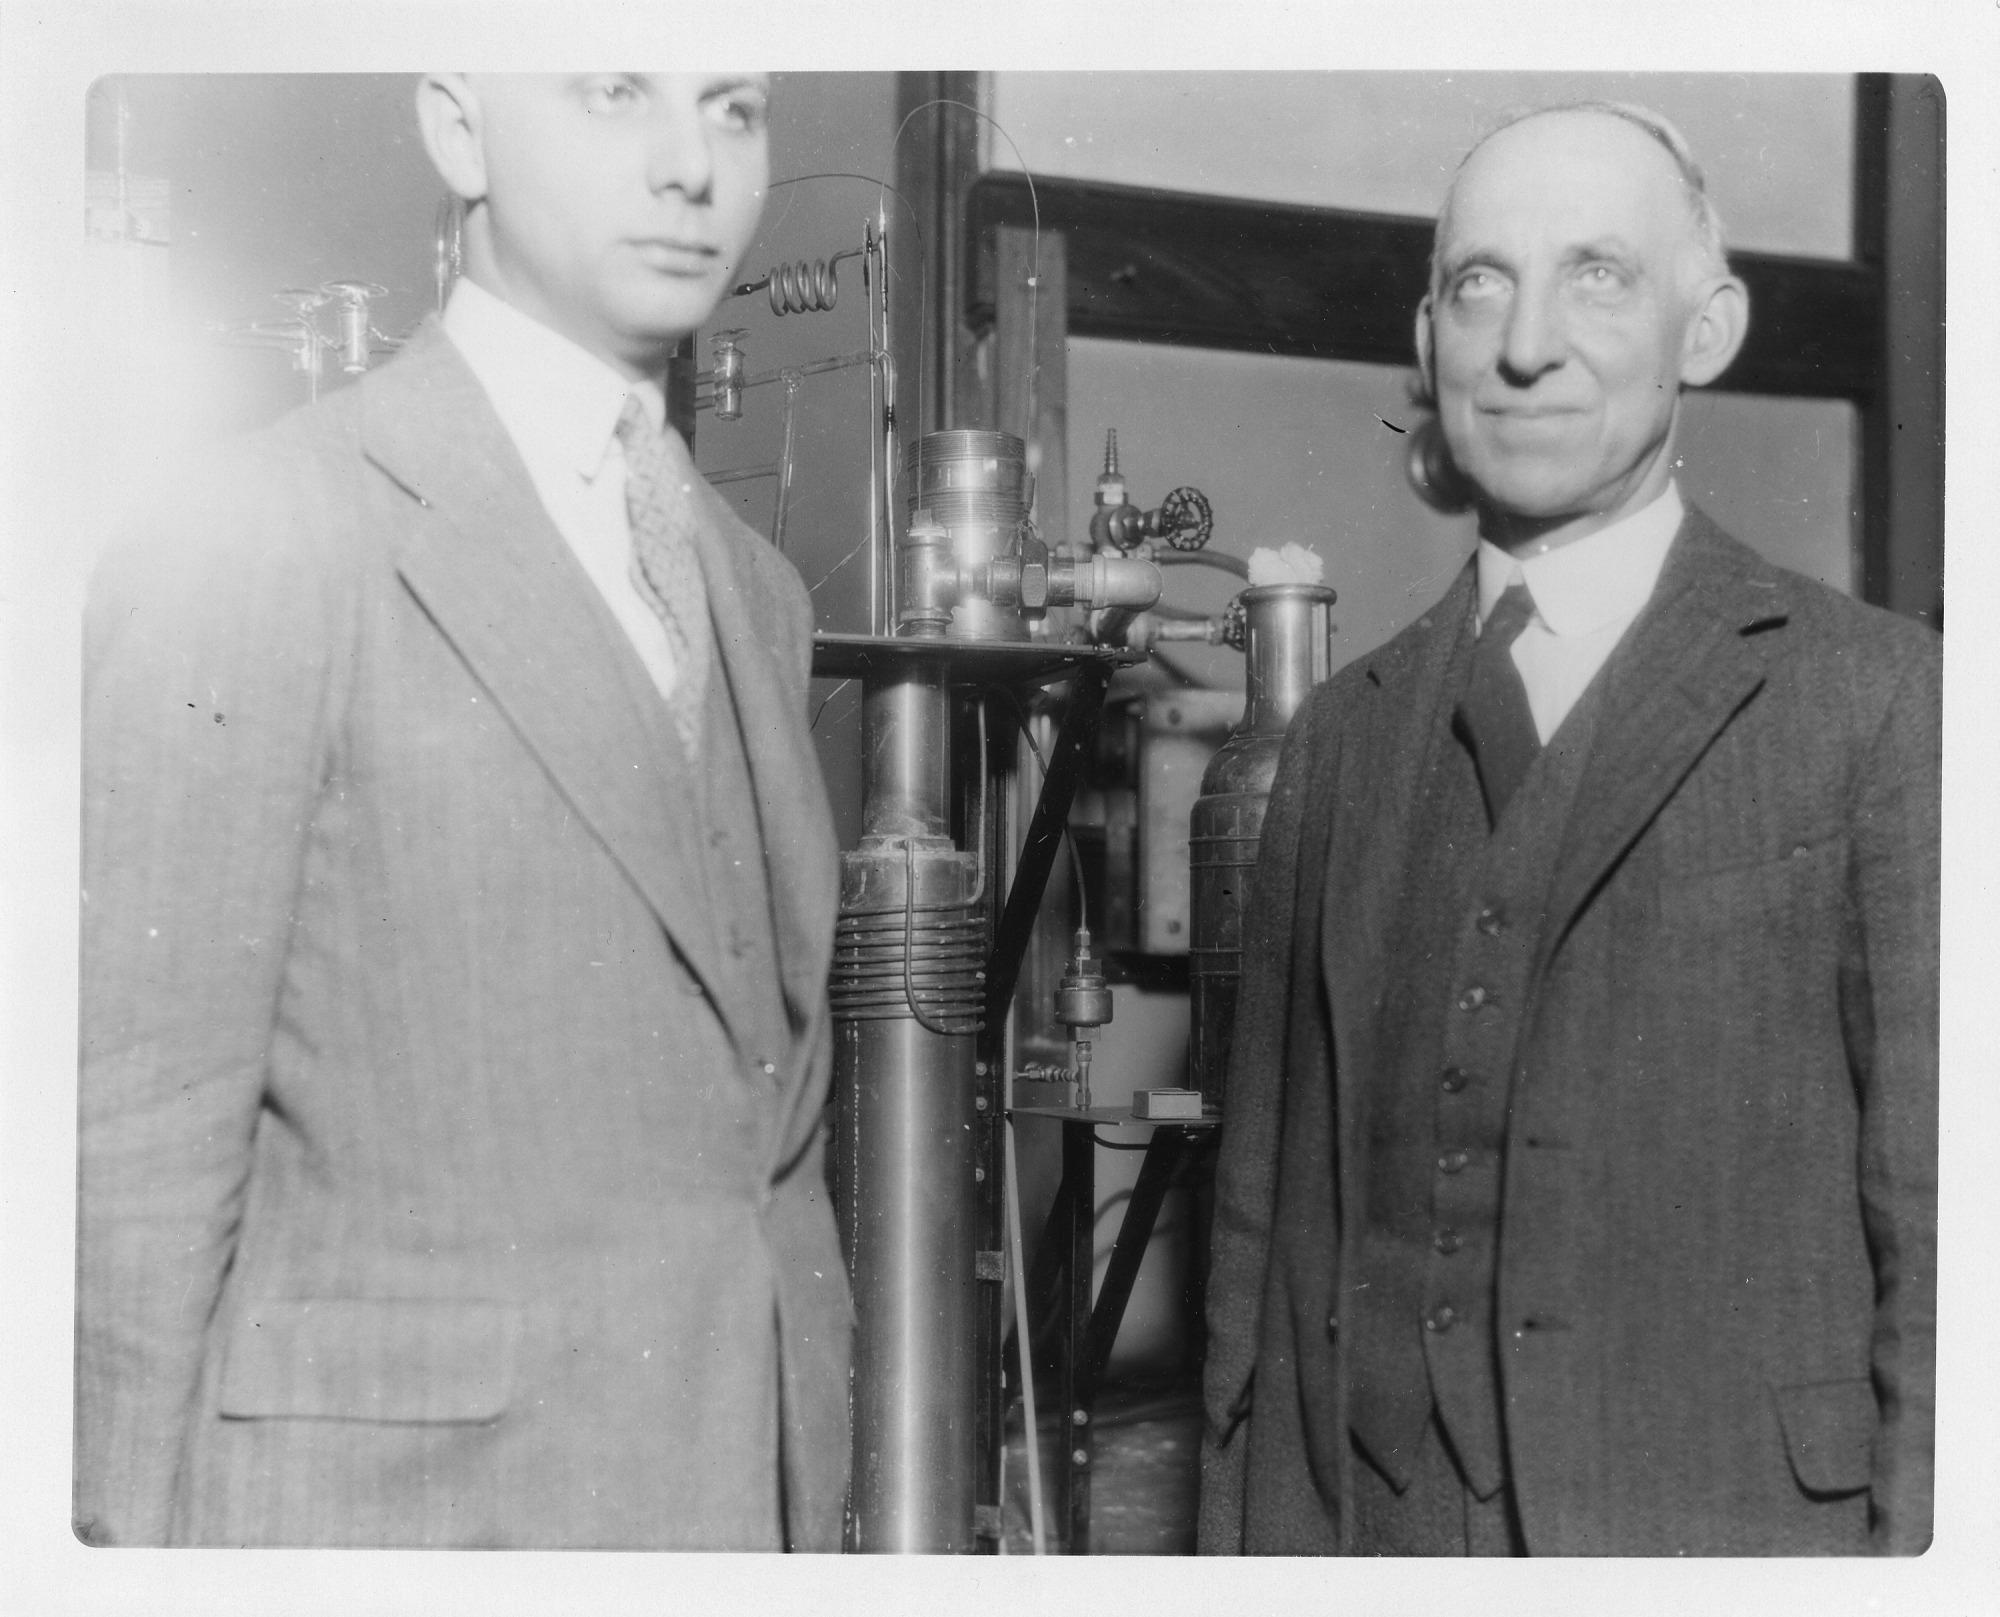 (left to right): Hobert Cutler Dickinson (1875-1949) and Ferdinand Graft Brickwedde (1903-1989)